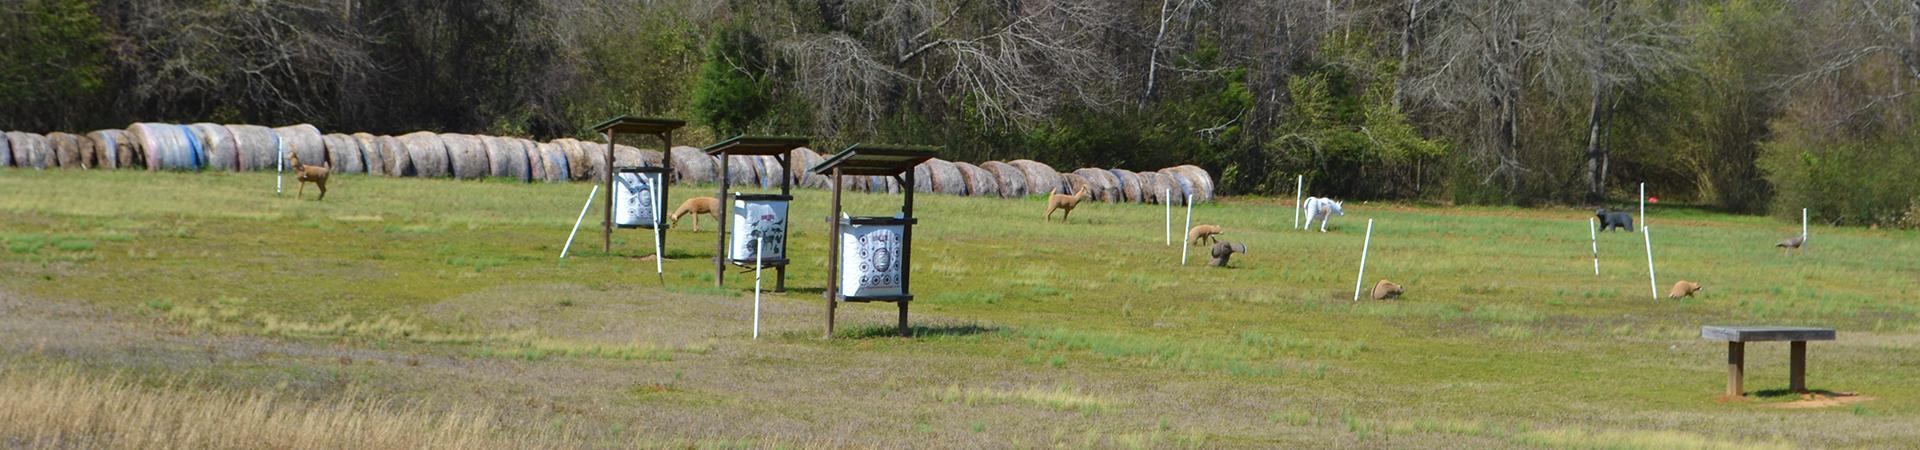 targets at archery range